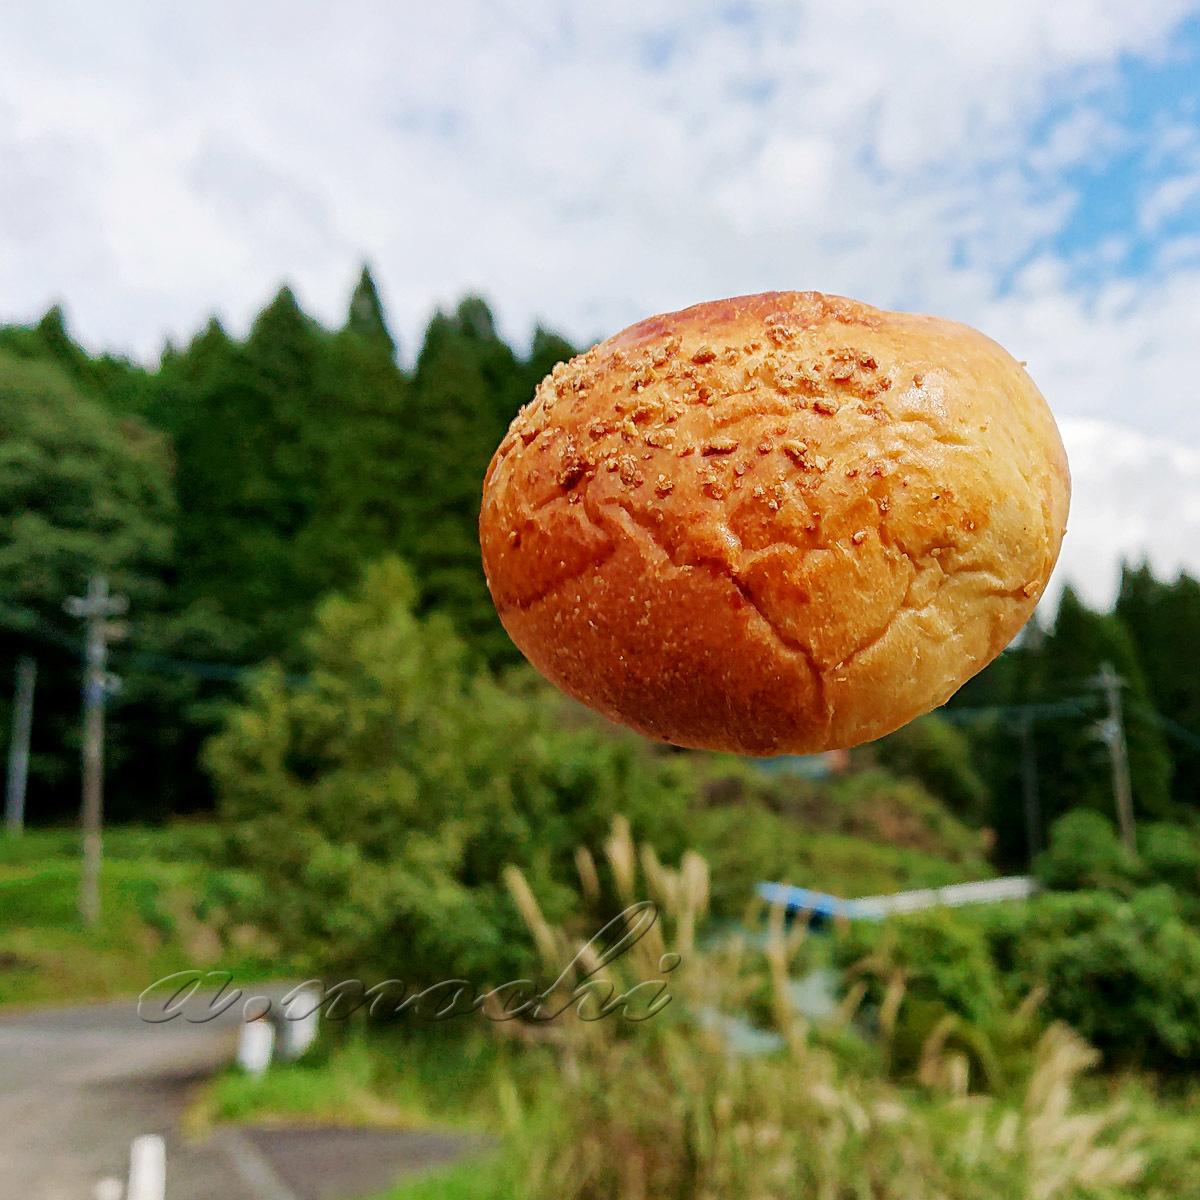 kokokyan_kurianpan.jpg